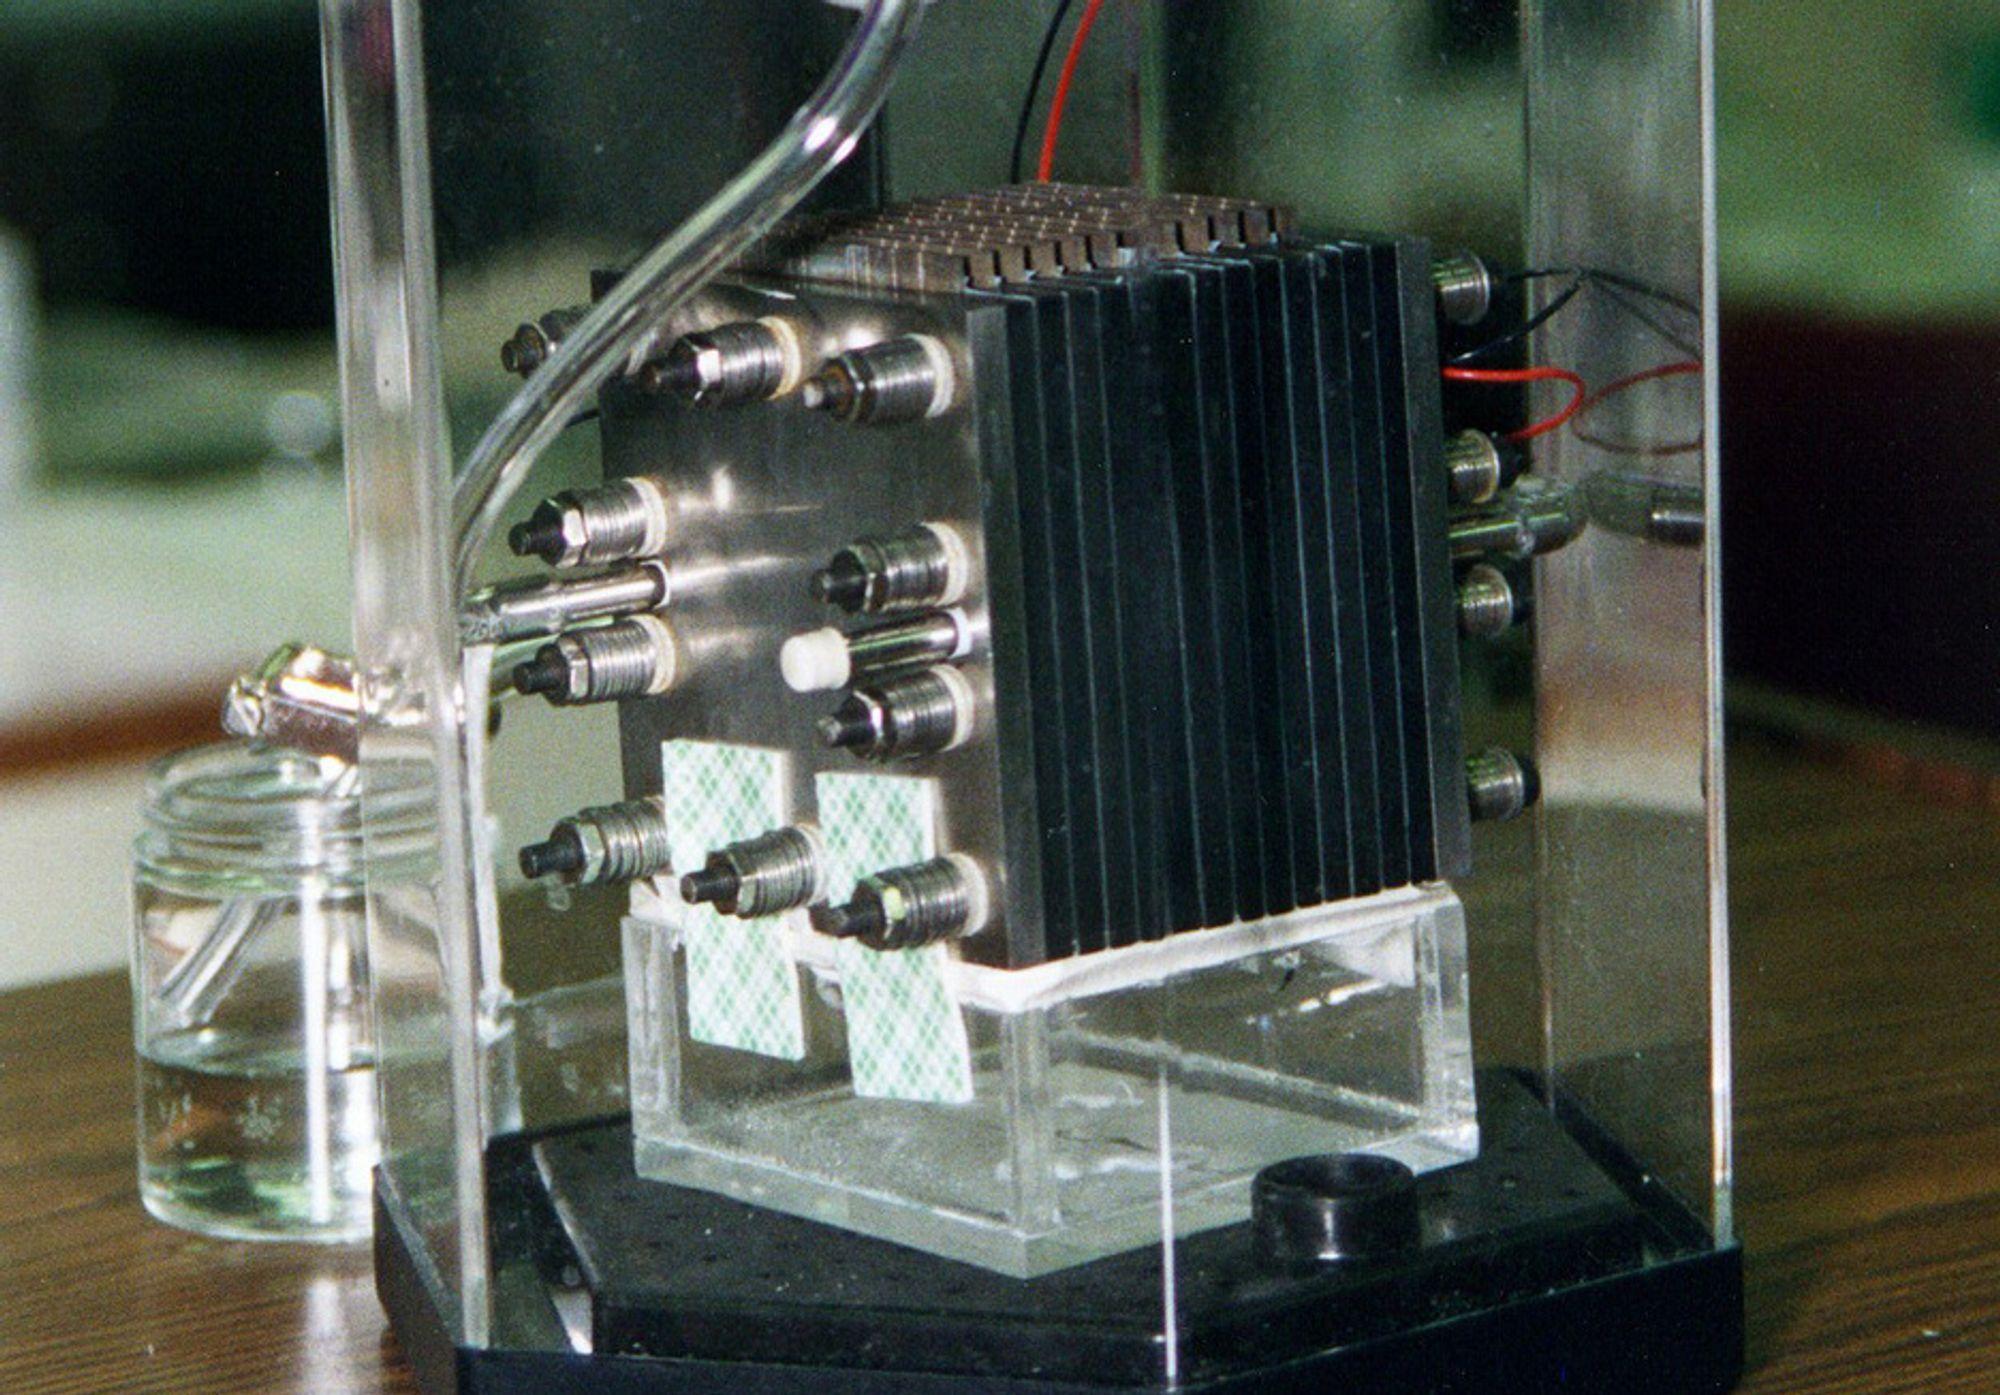 Brenselcelle med metanol som drivstoff. (Illustrasjonsfoto)